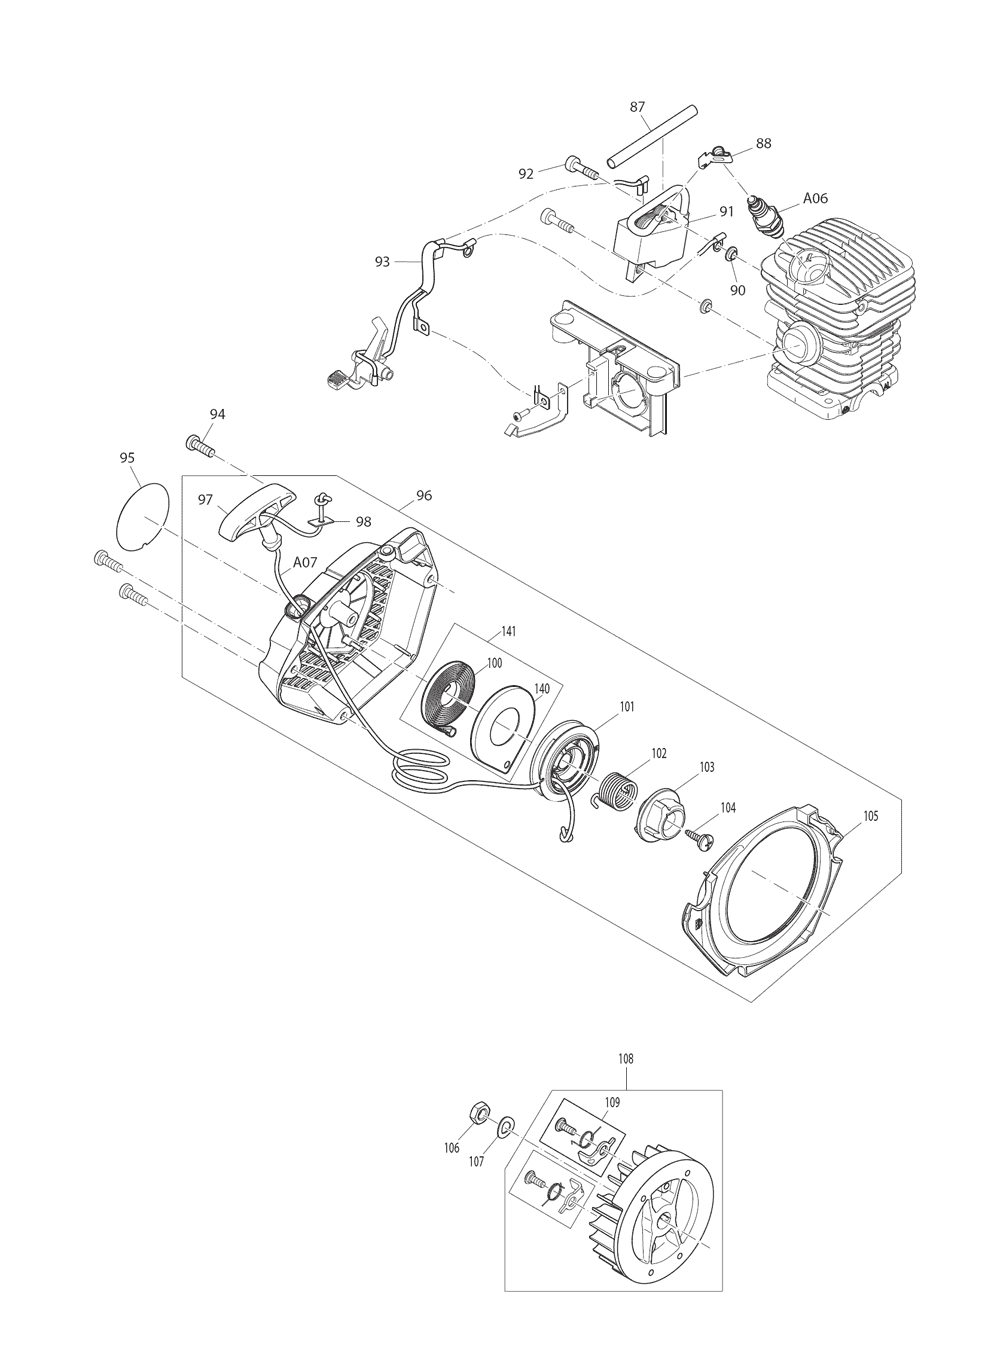 EA3201S40B-T4-Makita-PB-3Break Down